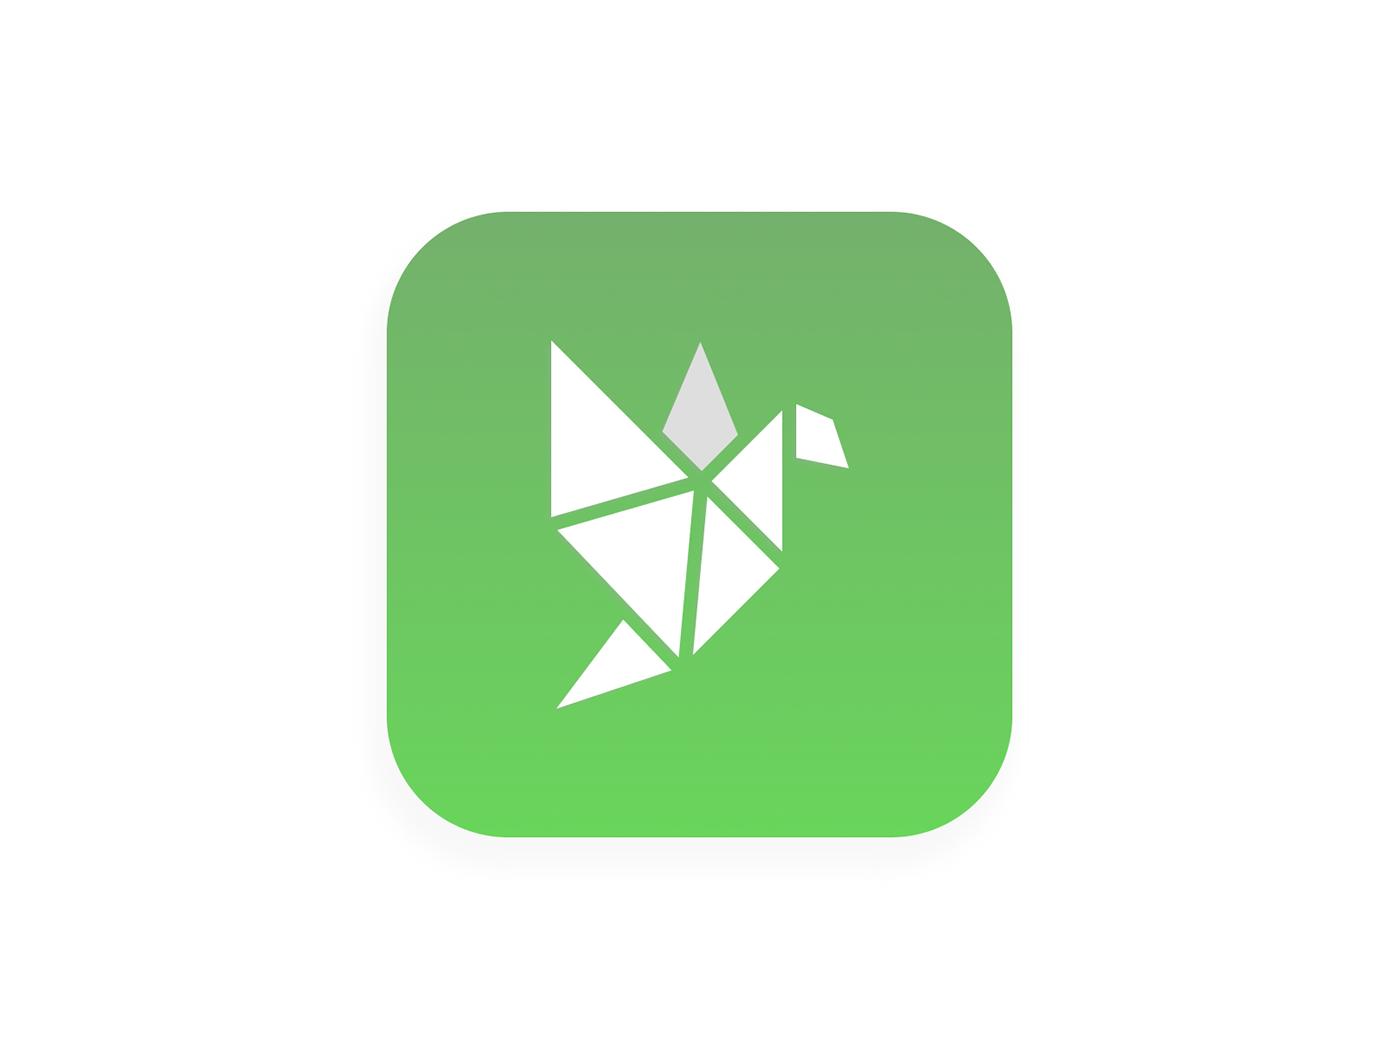 Daily UI #005- App icon